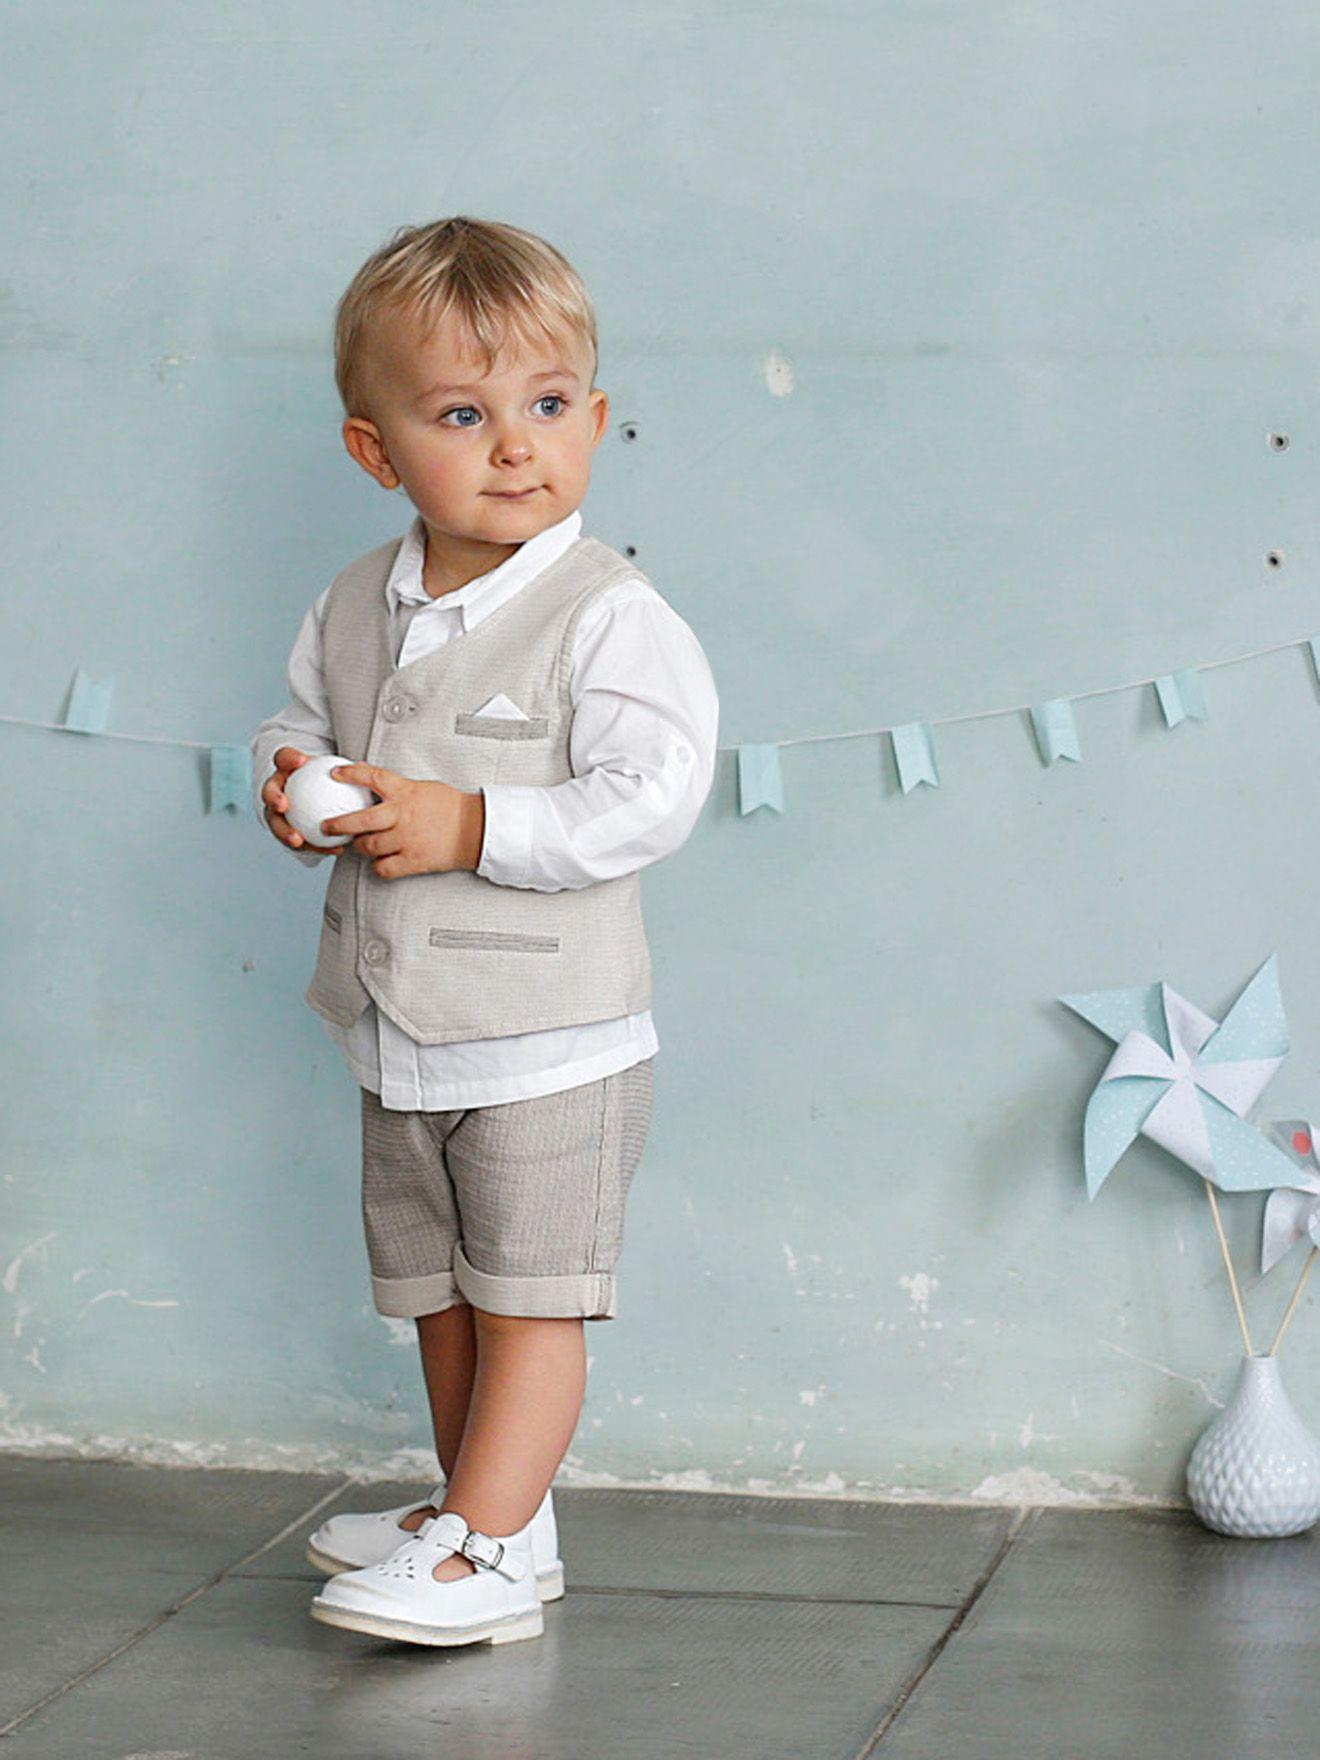 modern dresses for small kids for wedding | Baby z style | Pinterest ...